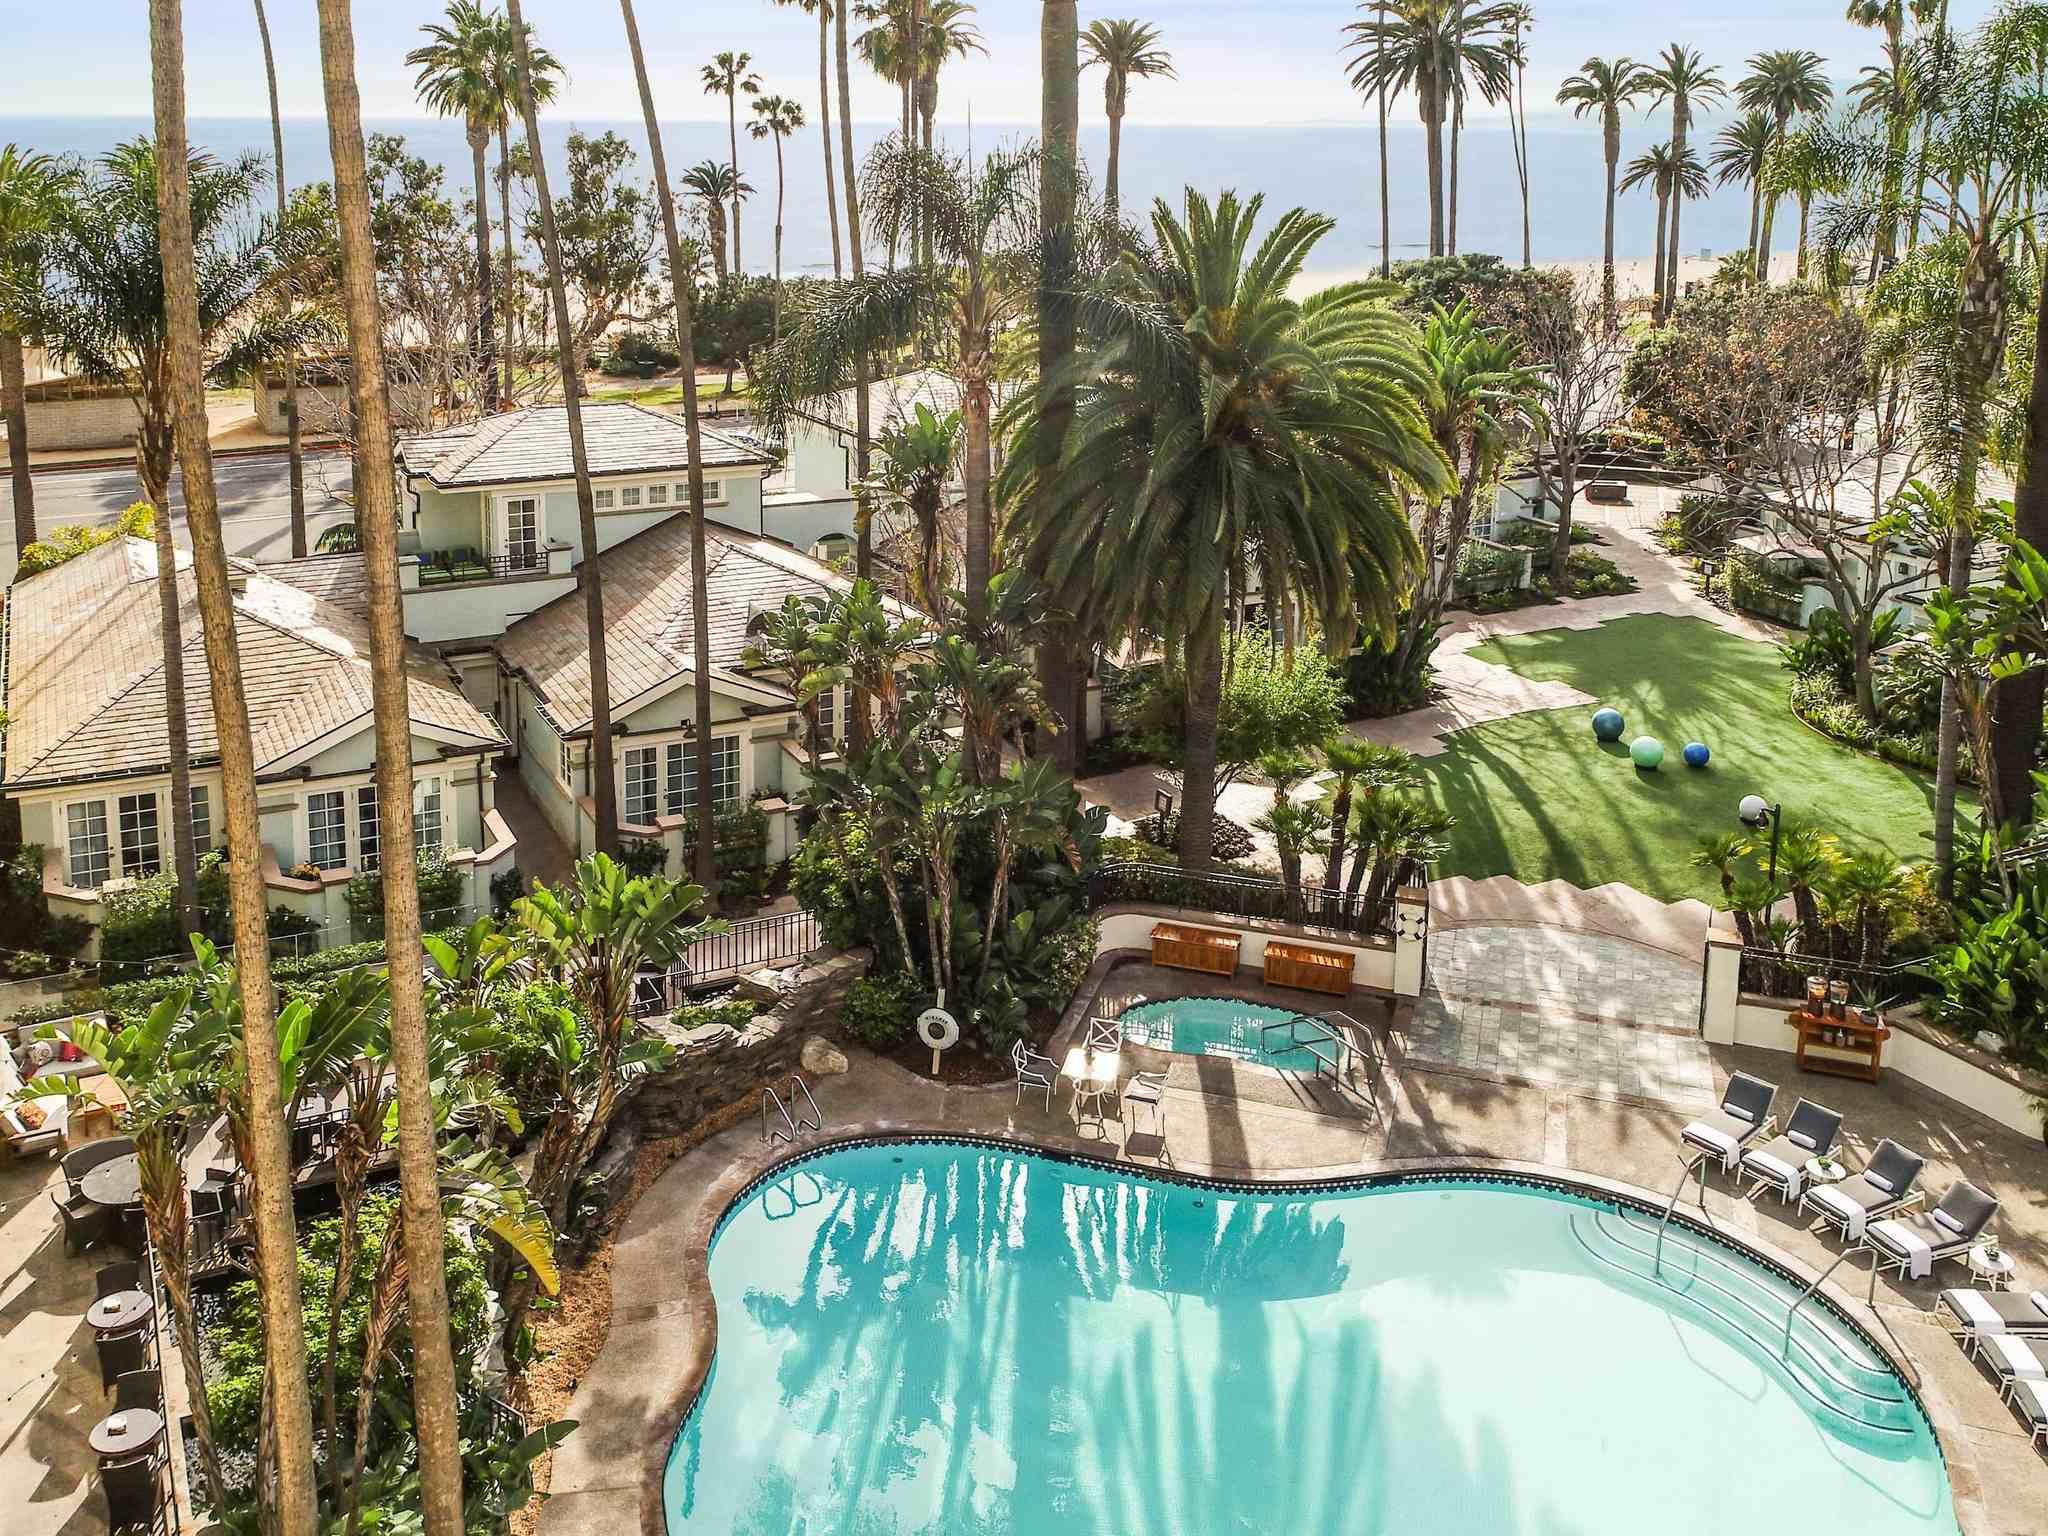 Hotel – Fairmont Miramar - Hotel & Bungalows